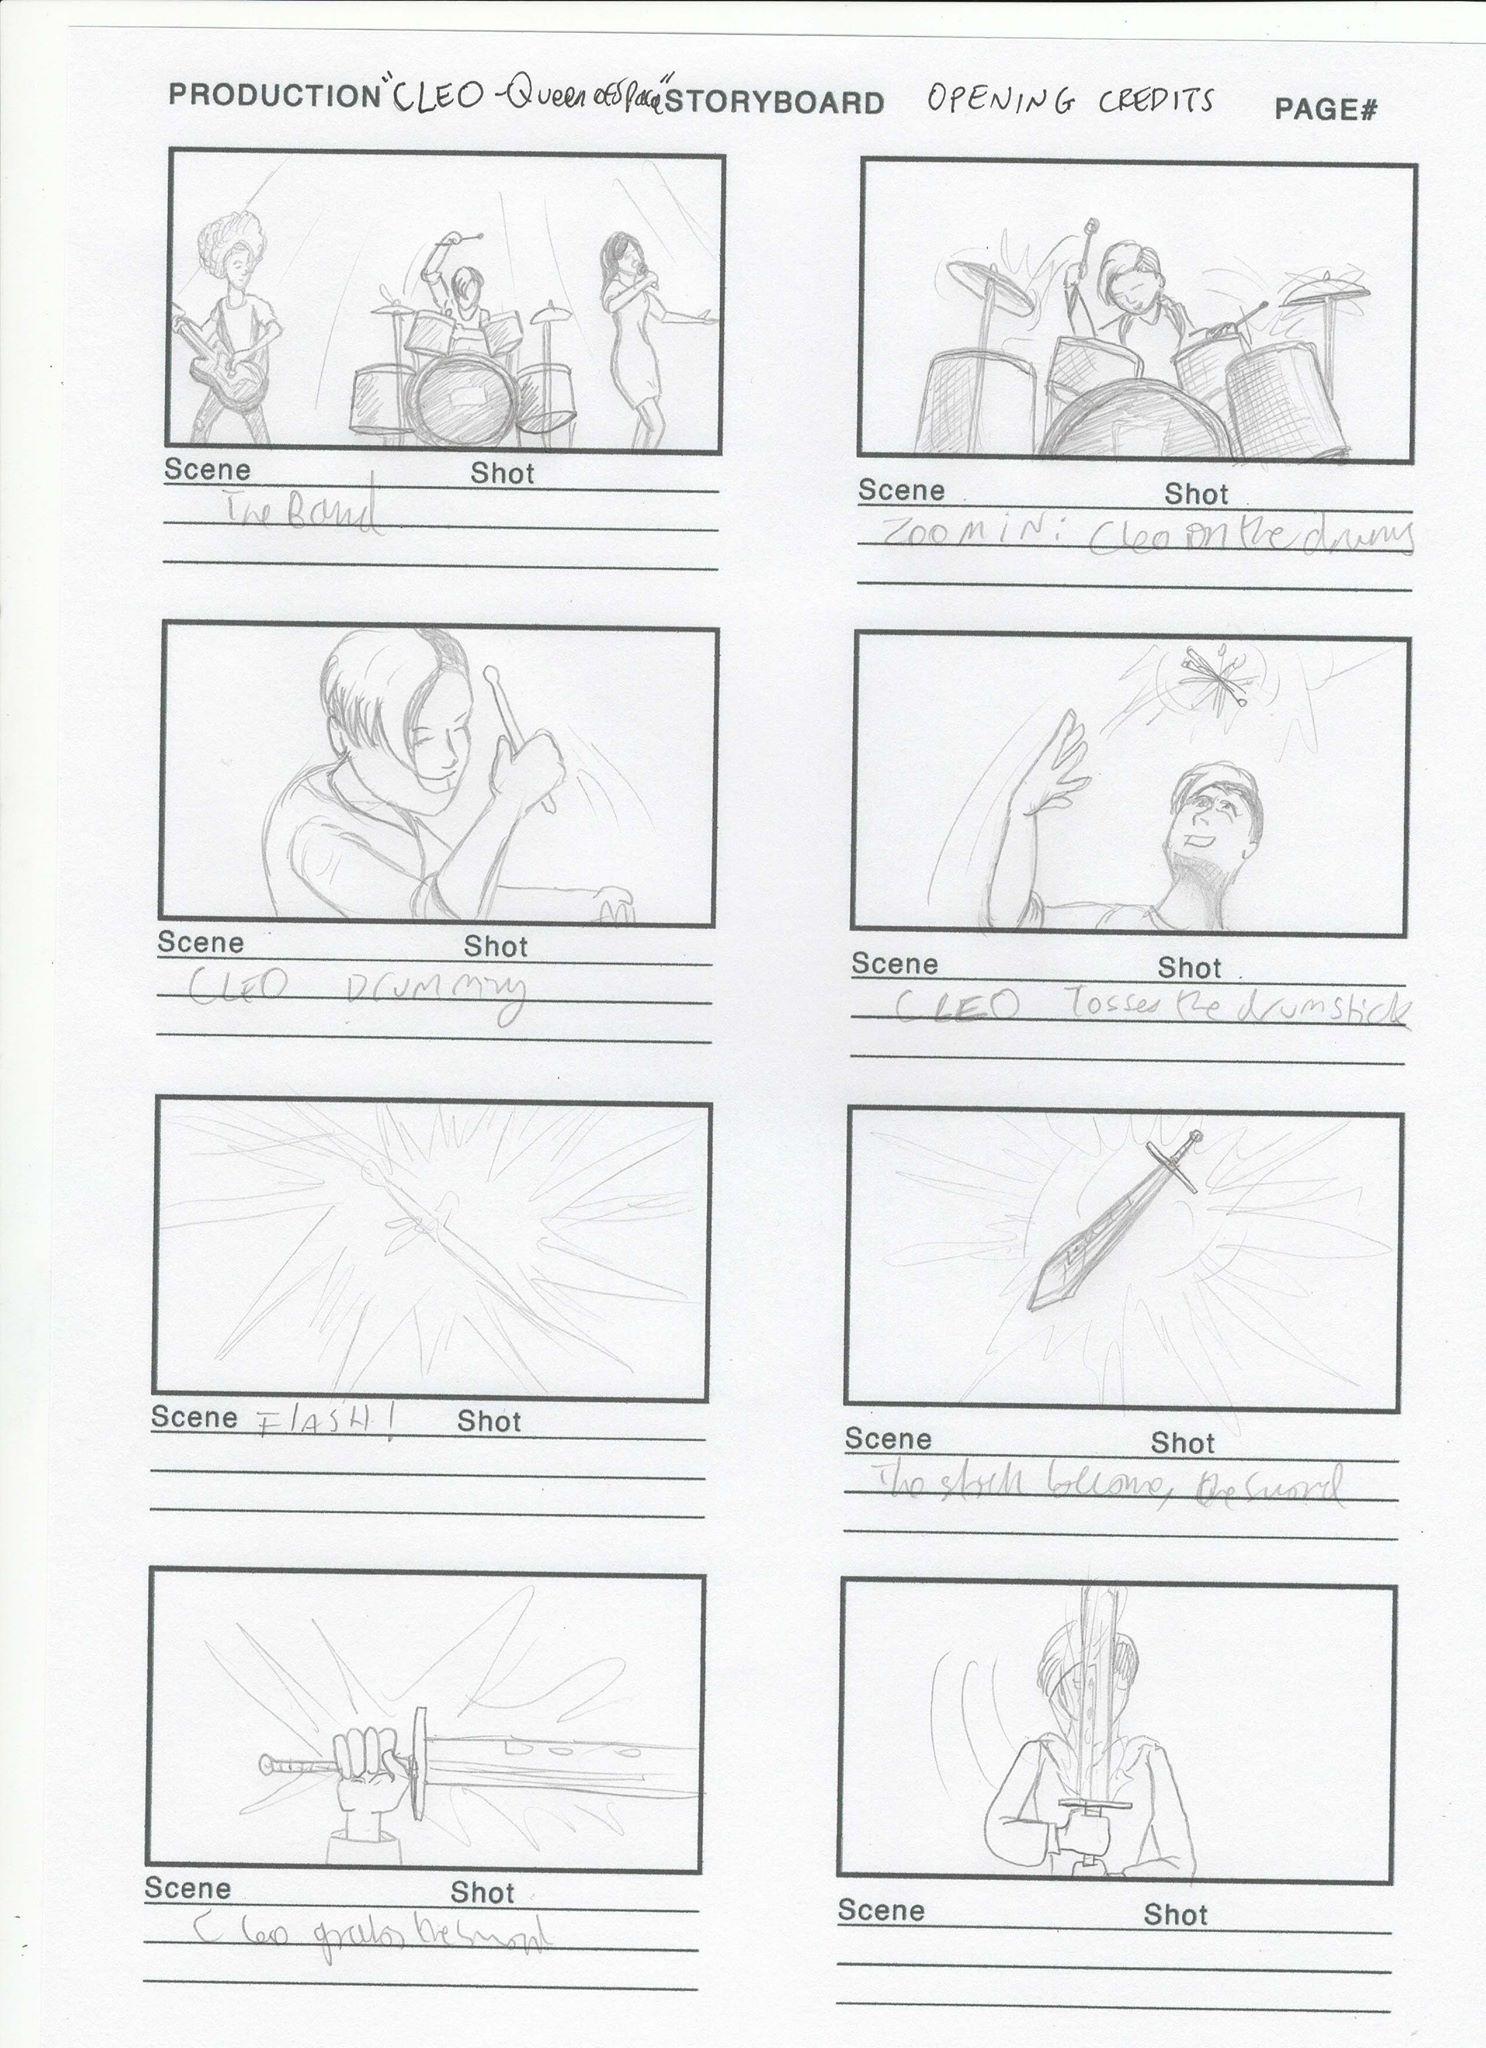 Original Storyboard - page 2